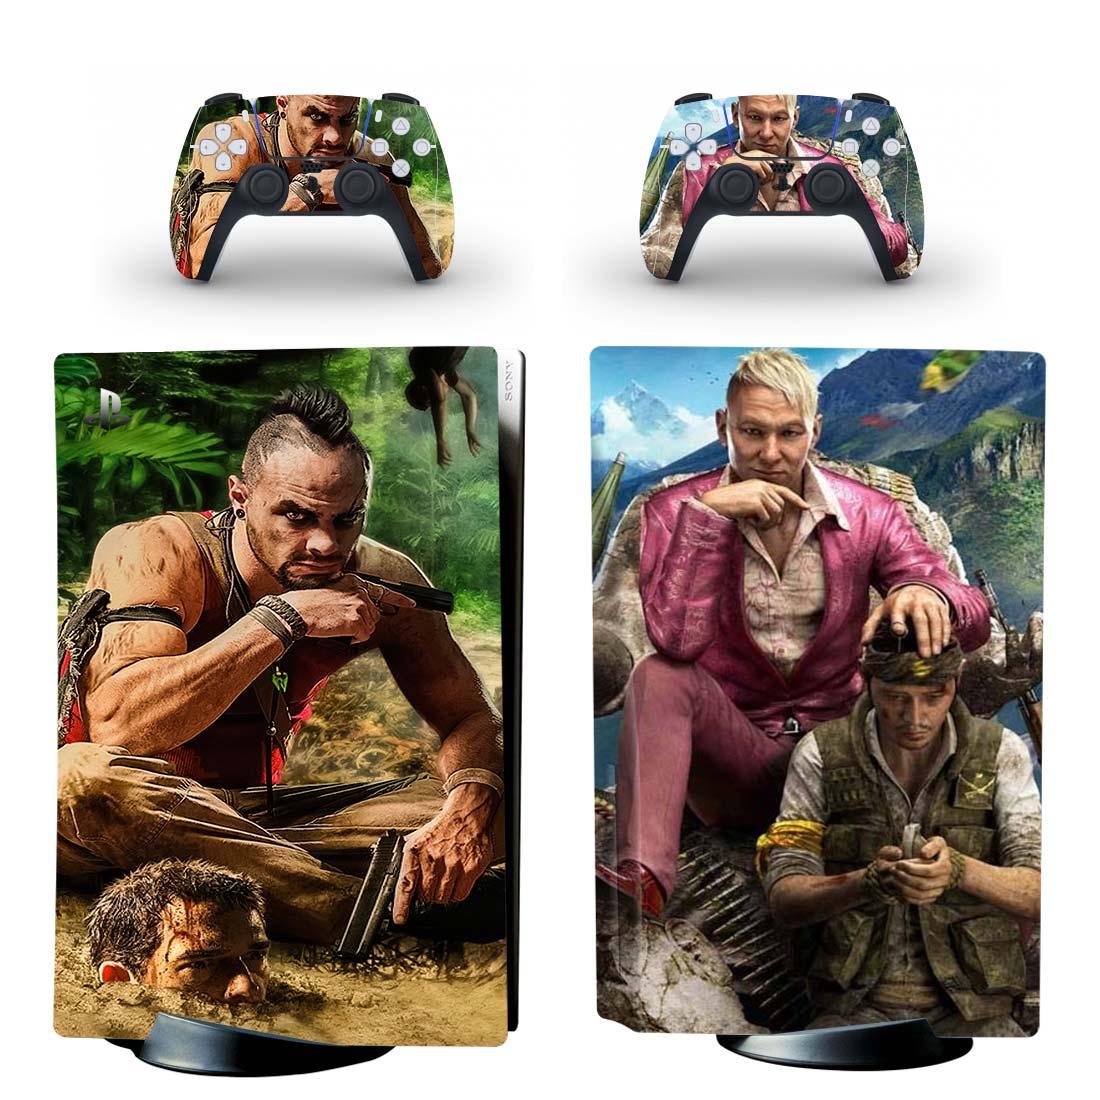 Far Cry 3 Vs Far Cry 4 Skin Sticker Decal For PlayStation 5